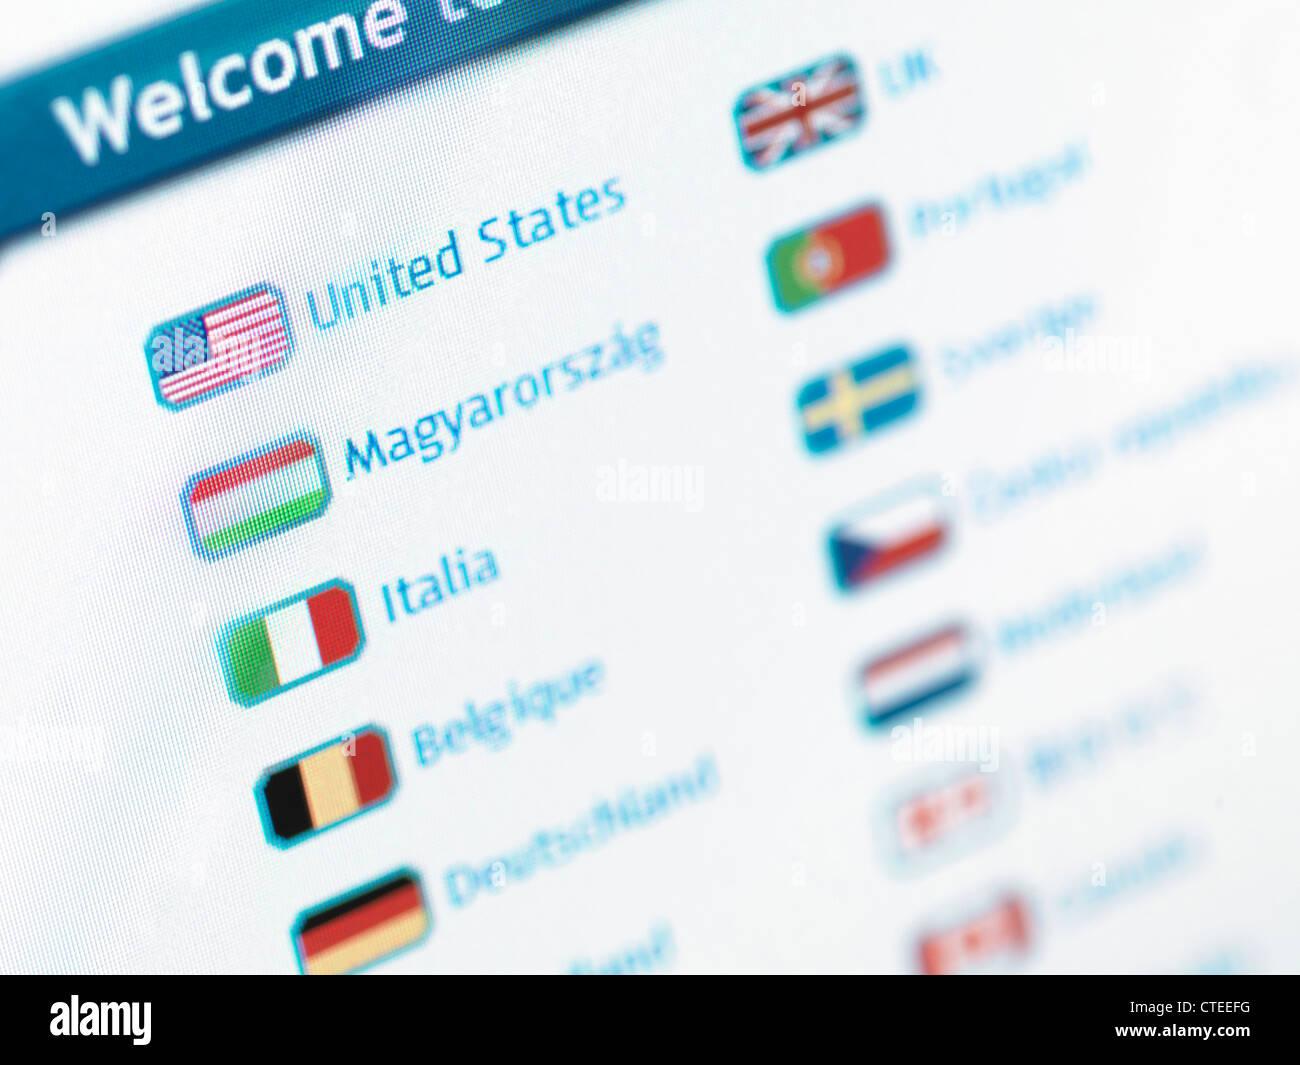 E-commerce web site language selection menu on a display - Stock Image